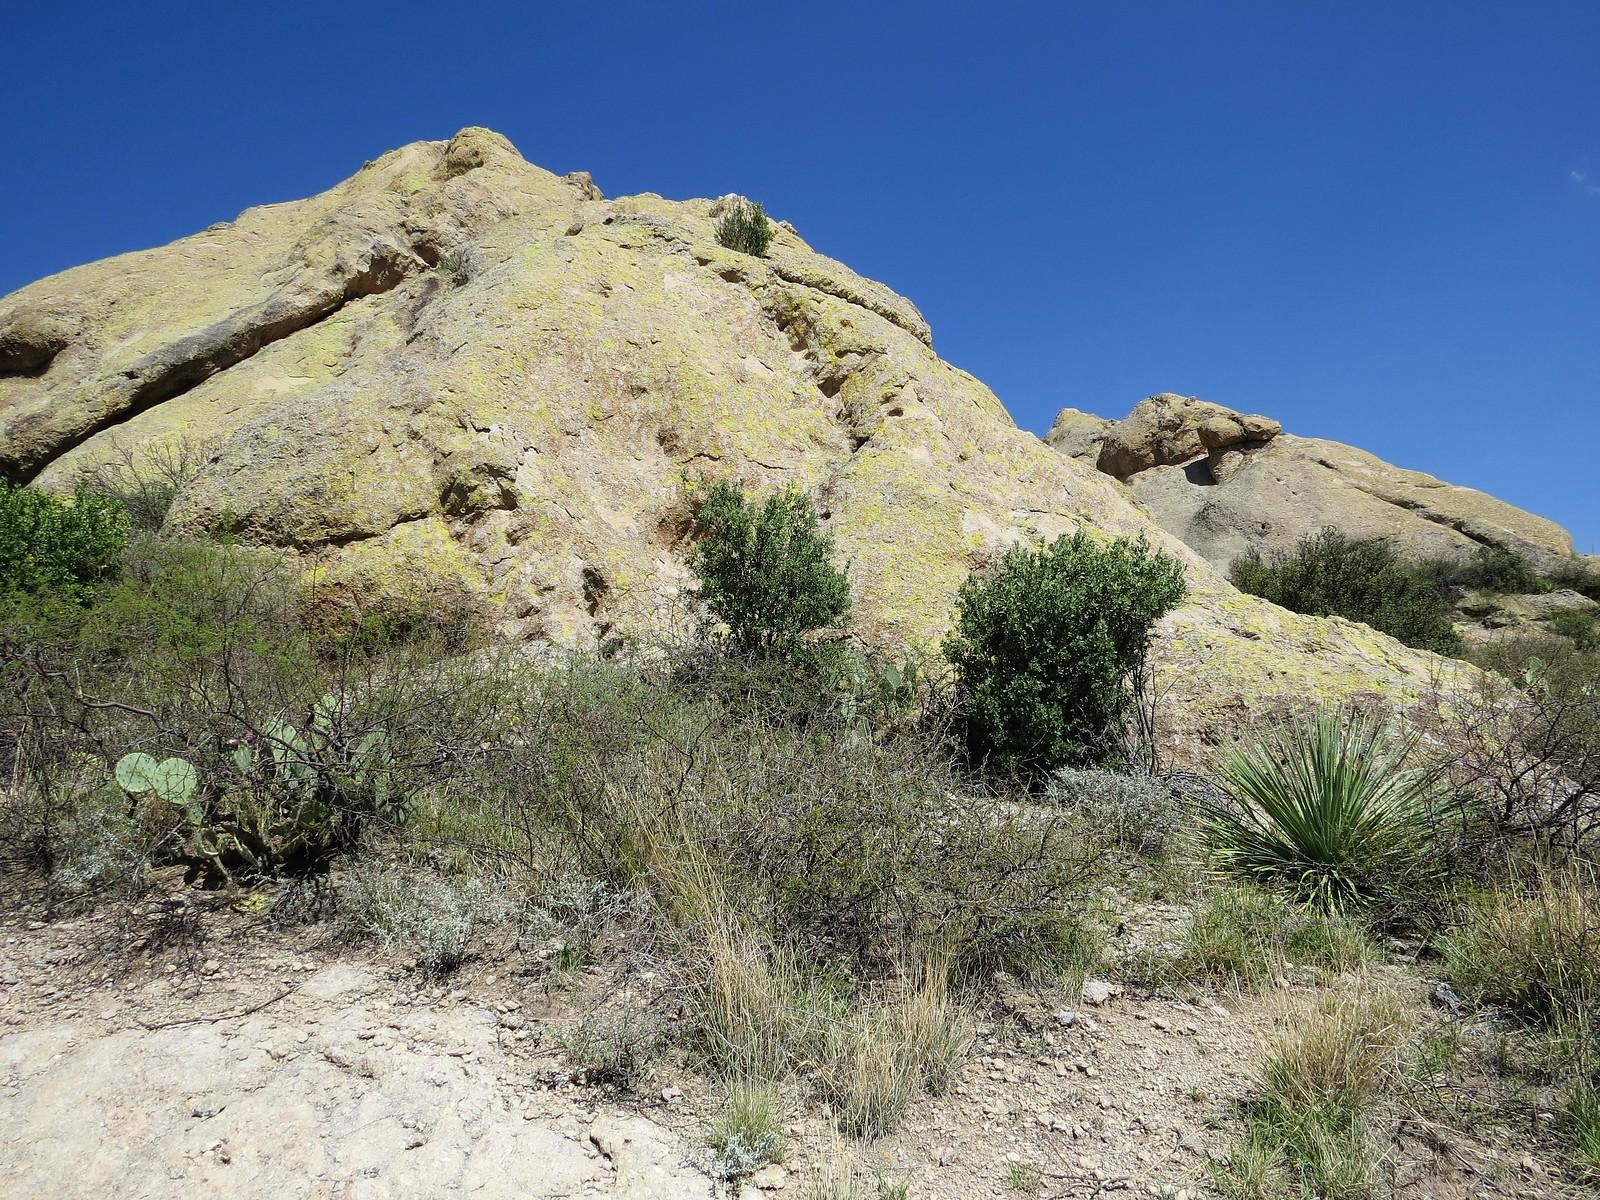 La Cueva Rocks, Organ Mountains, NM